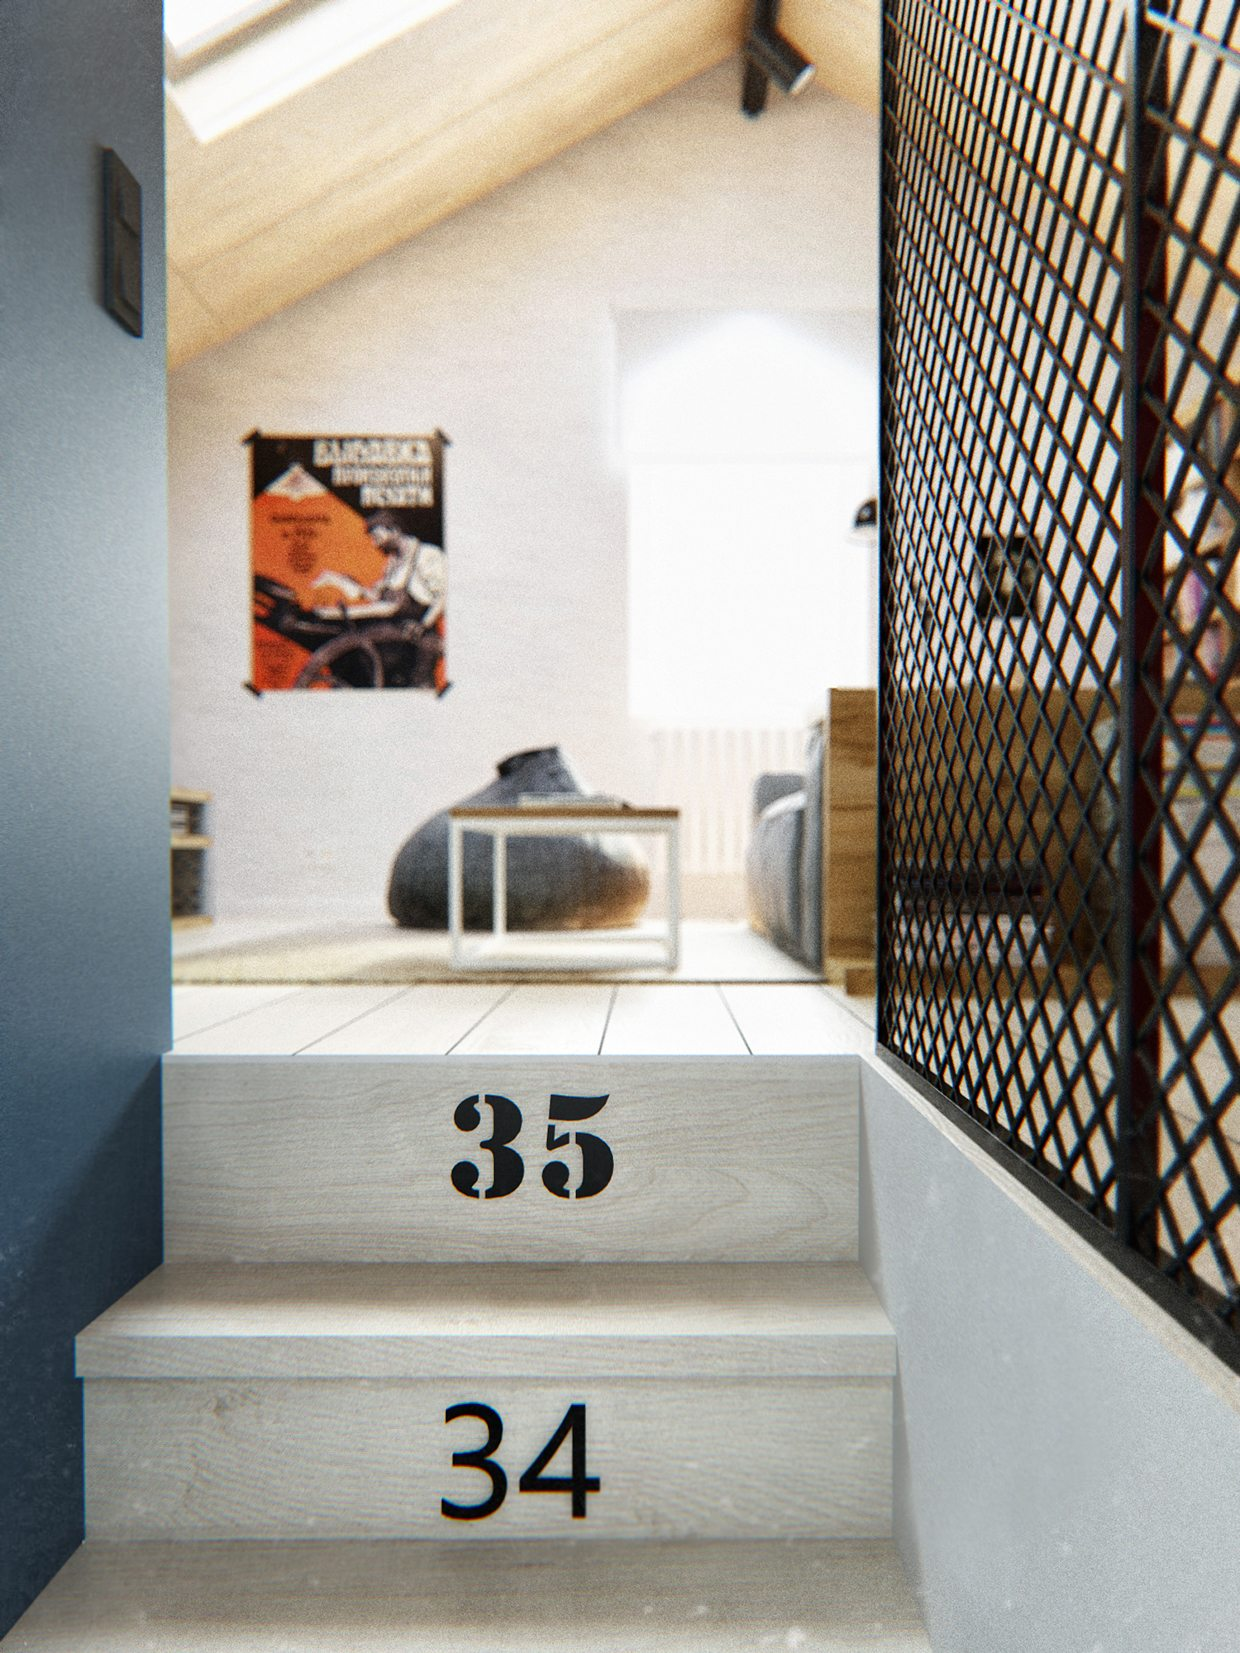 Duplex Penthouse With Scandinavian Aesthetics  Industrial